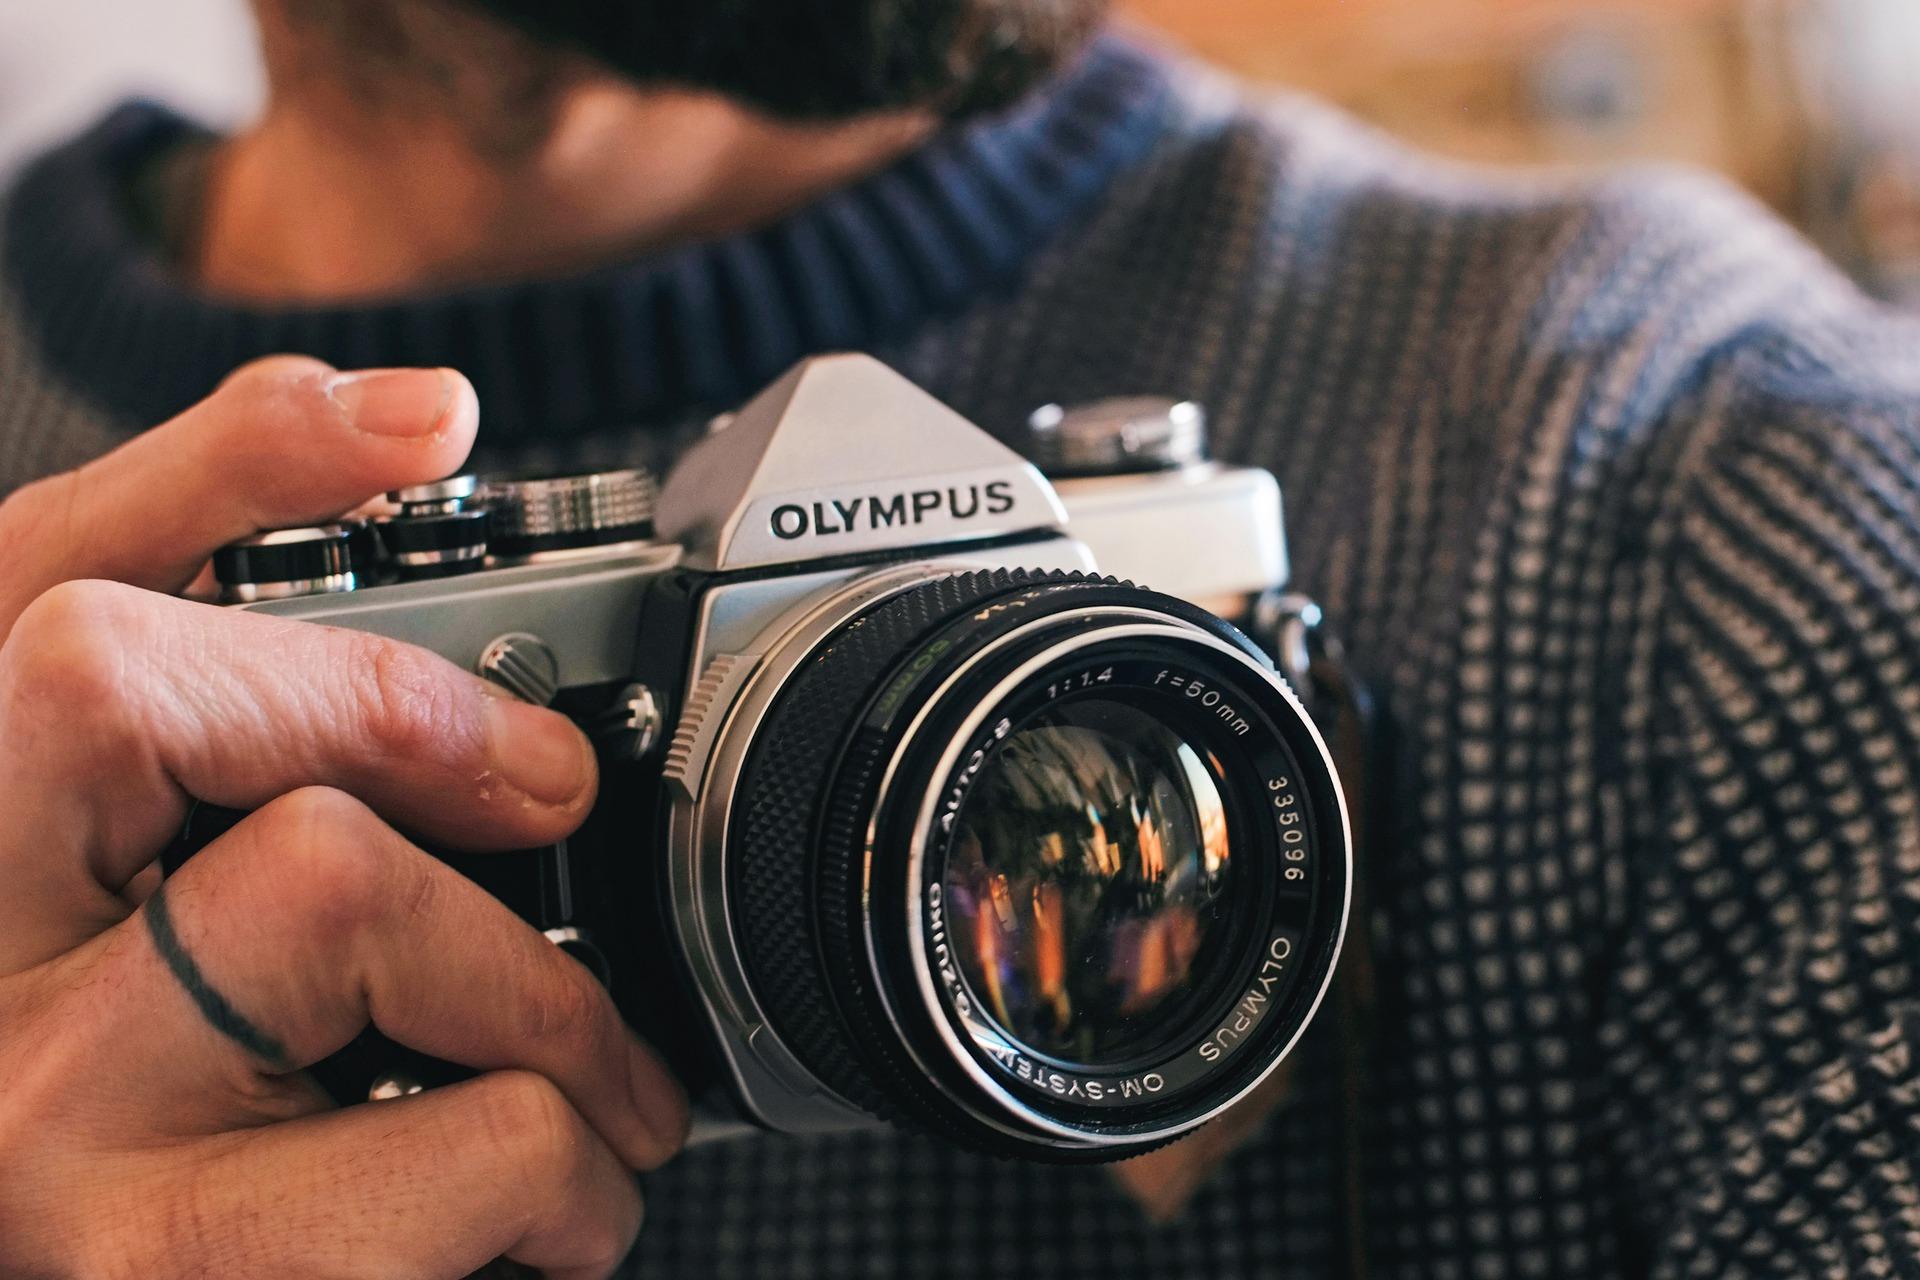 Olympus camera (Pic: Juraj Varga/Pixabay)